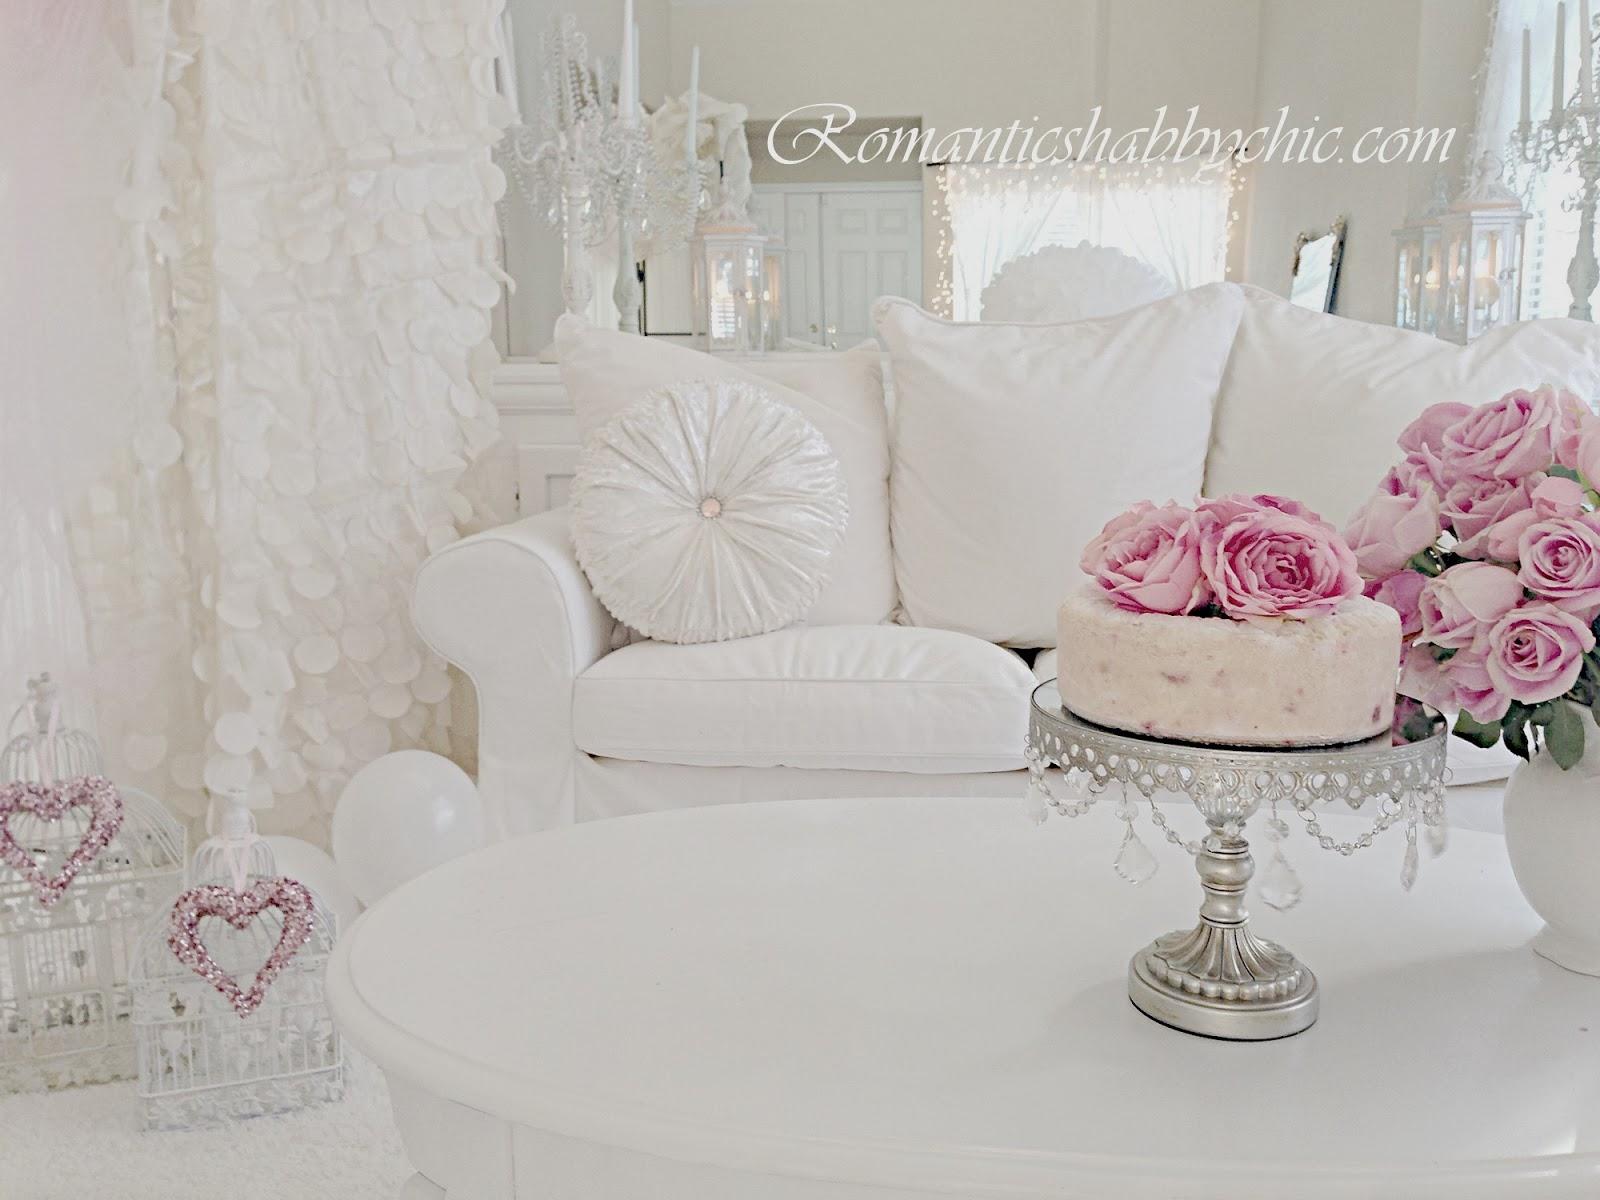 Romantic Shabby Chic Home Romantic Shabby Chic Blog